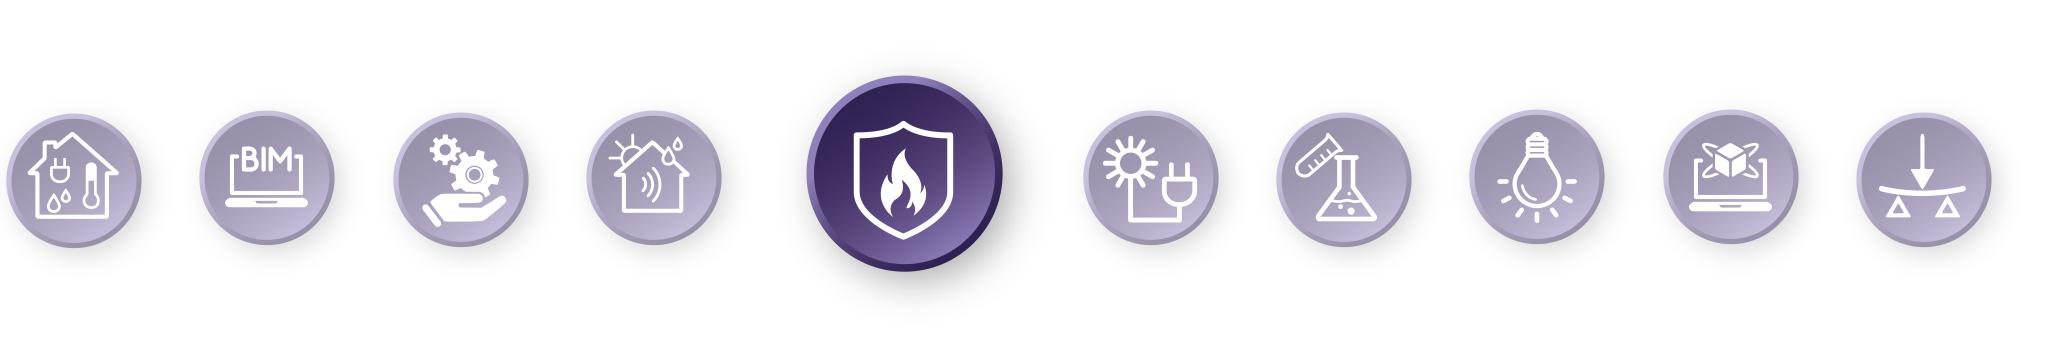 Piktogramm-Leiste mit hervorgehobenem Brandschutz-Symbol